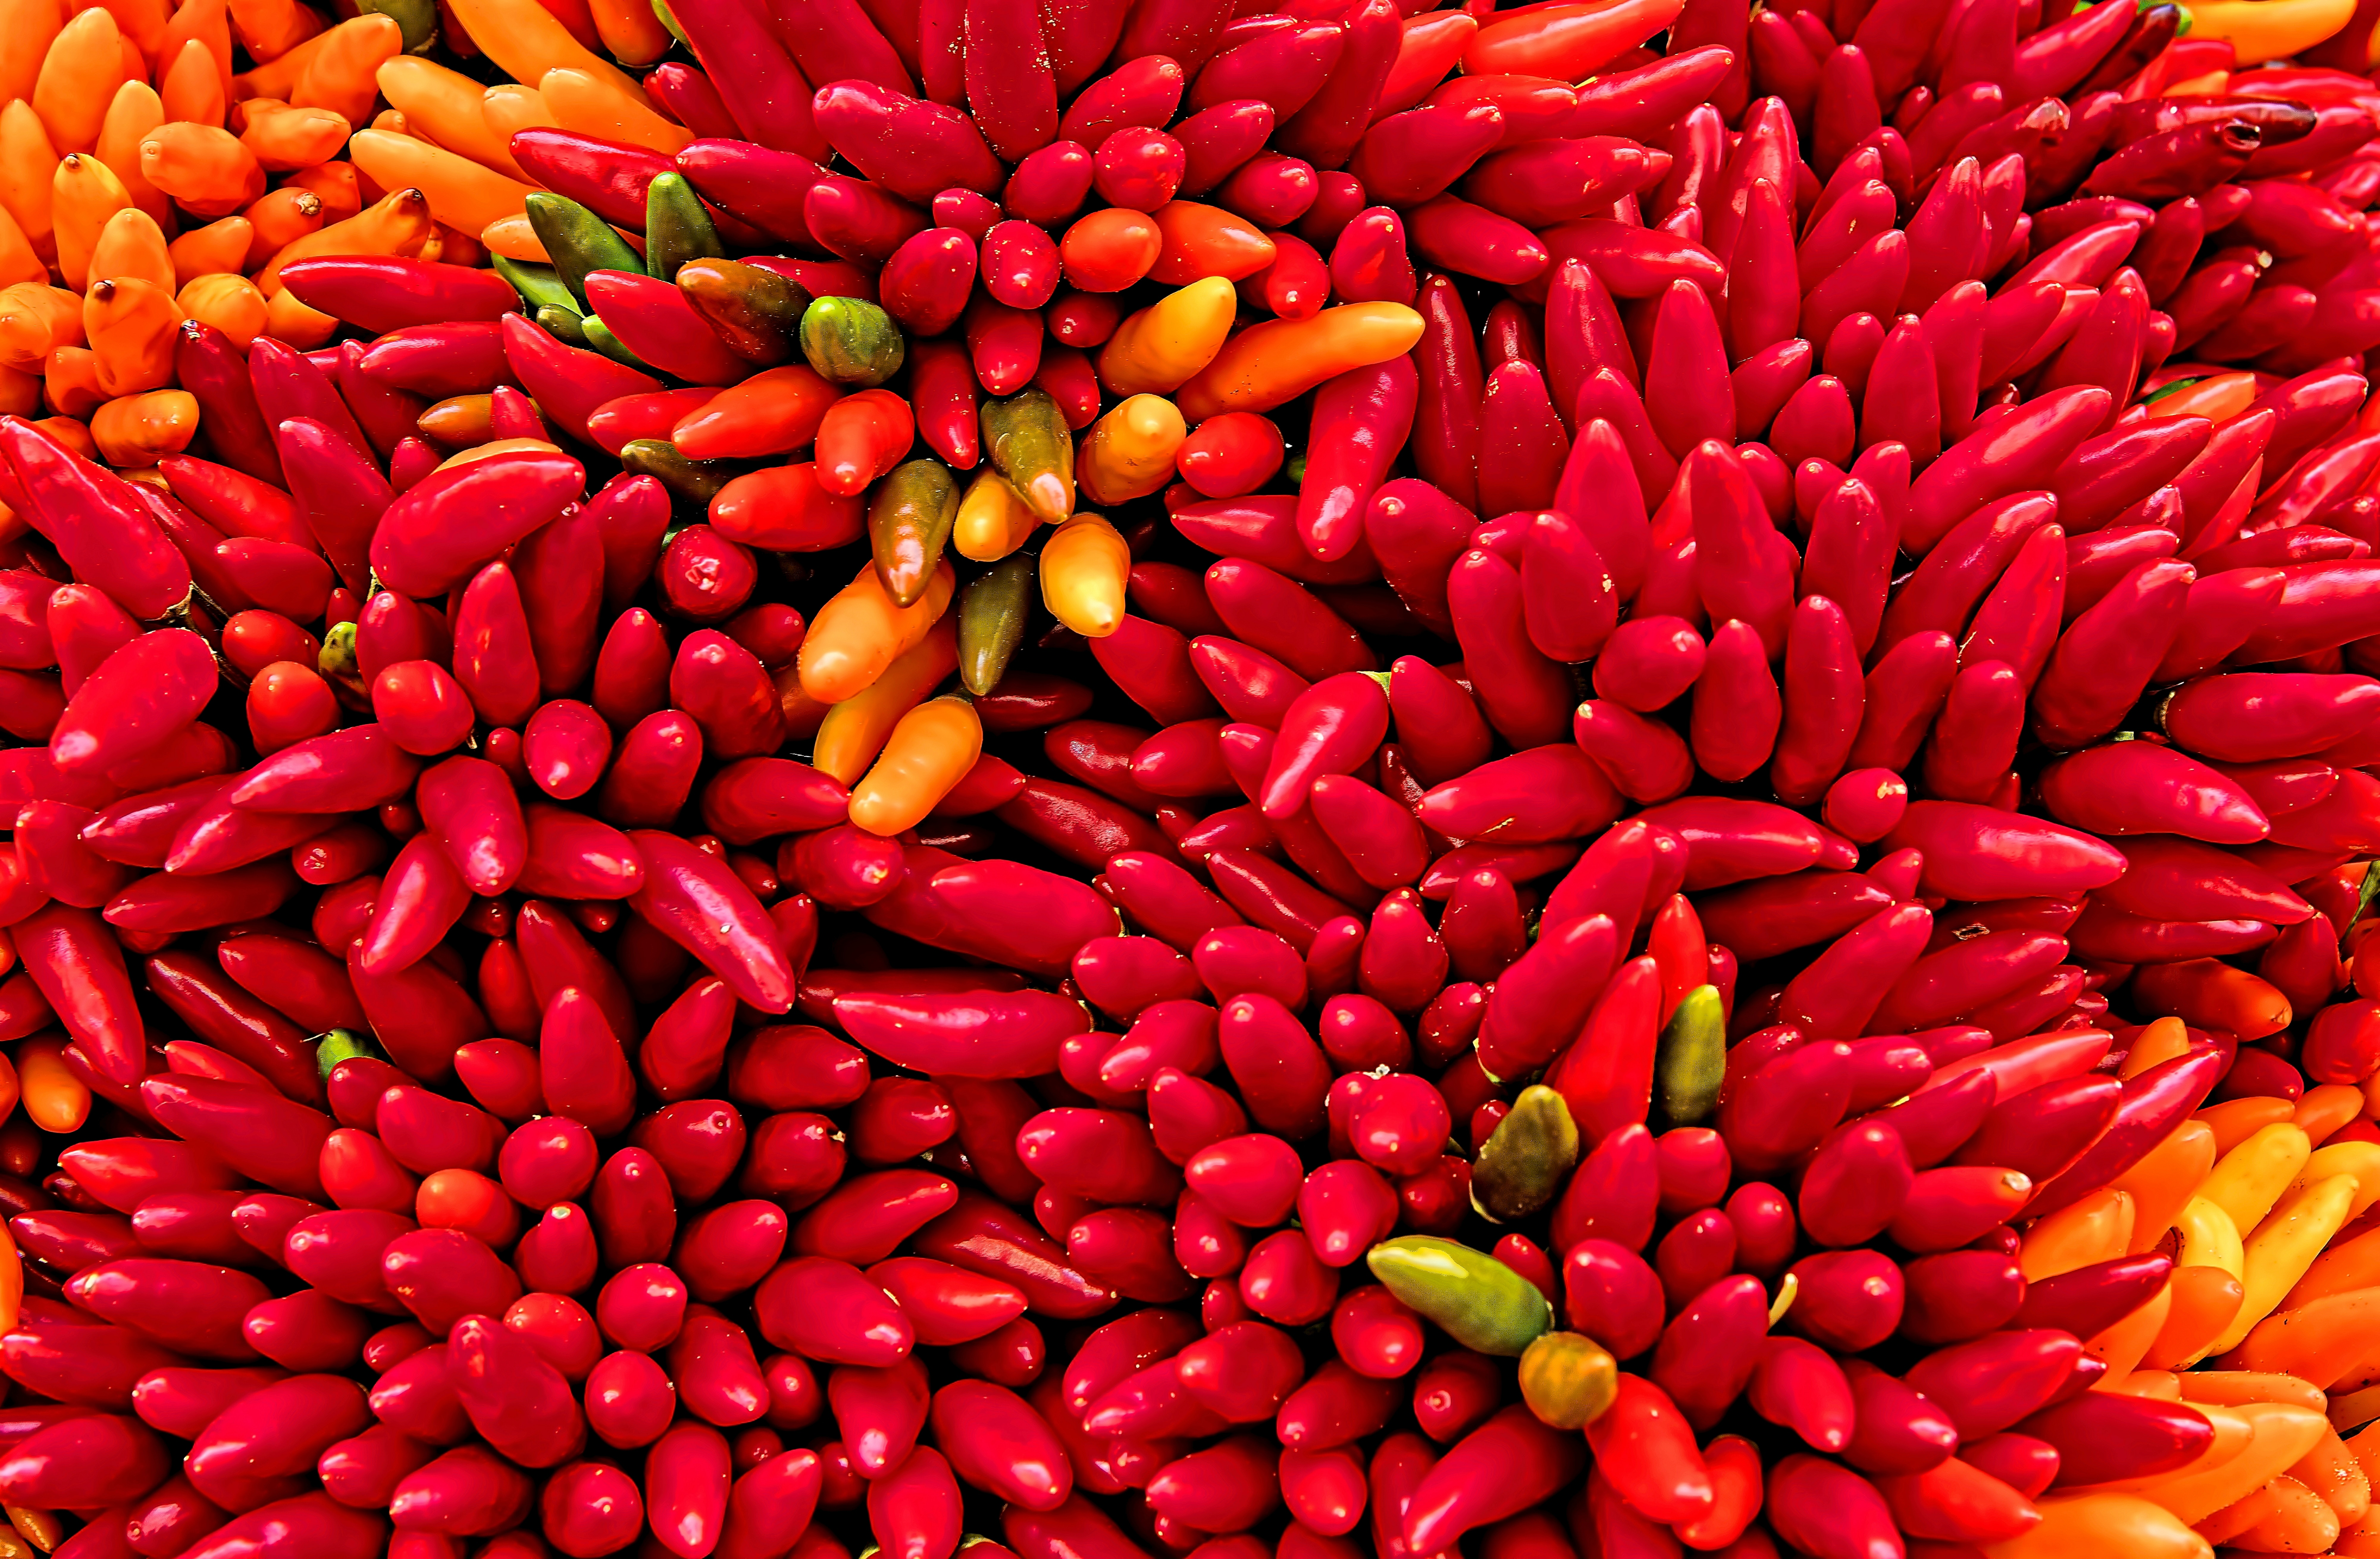 5317365 8000x5240 wallpaper vegitable market chili color 8000x5240